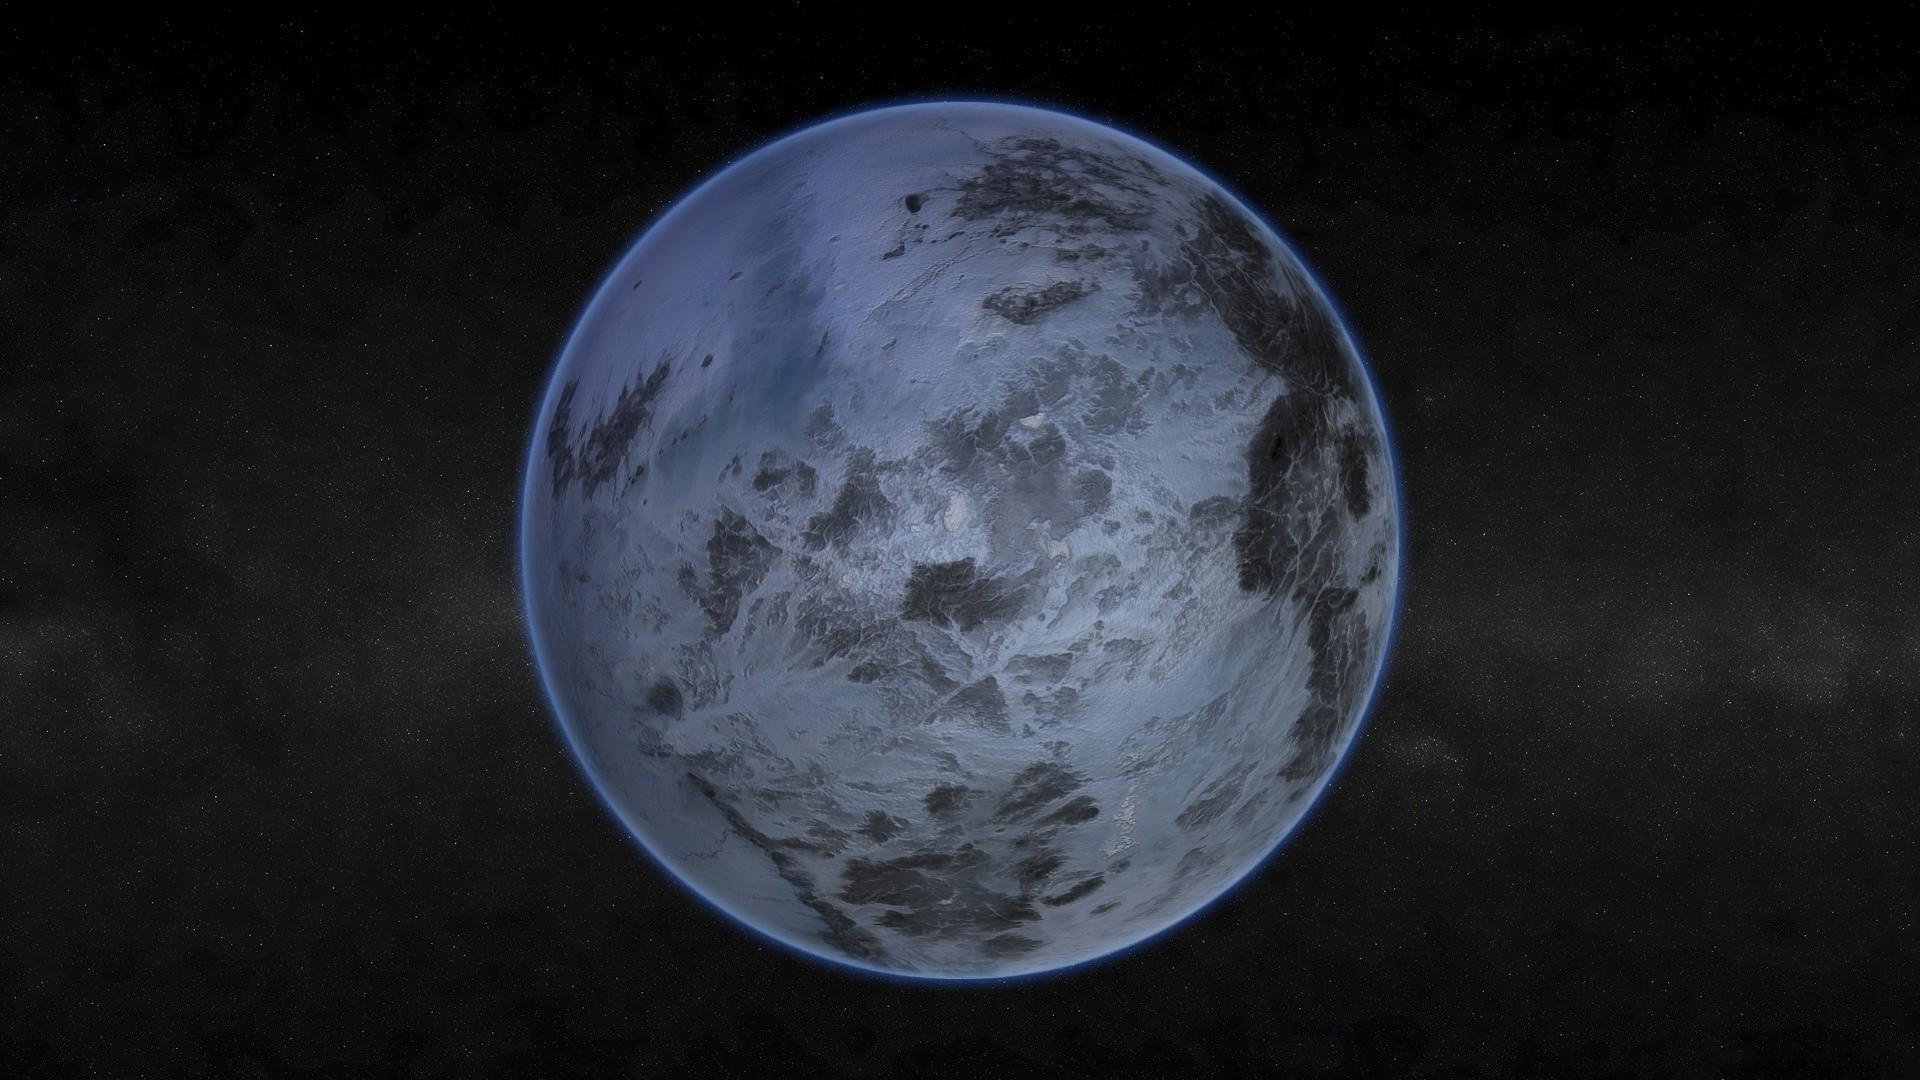 General 1920x1080 space Pluto space art Solar System digital art